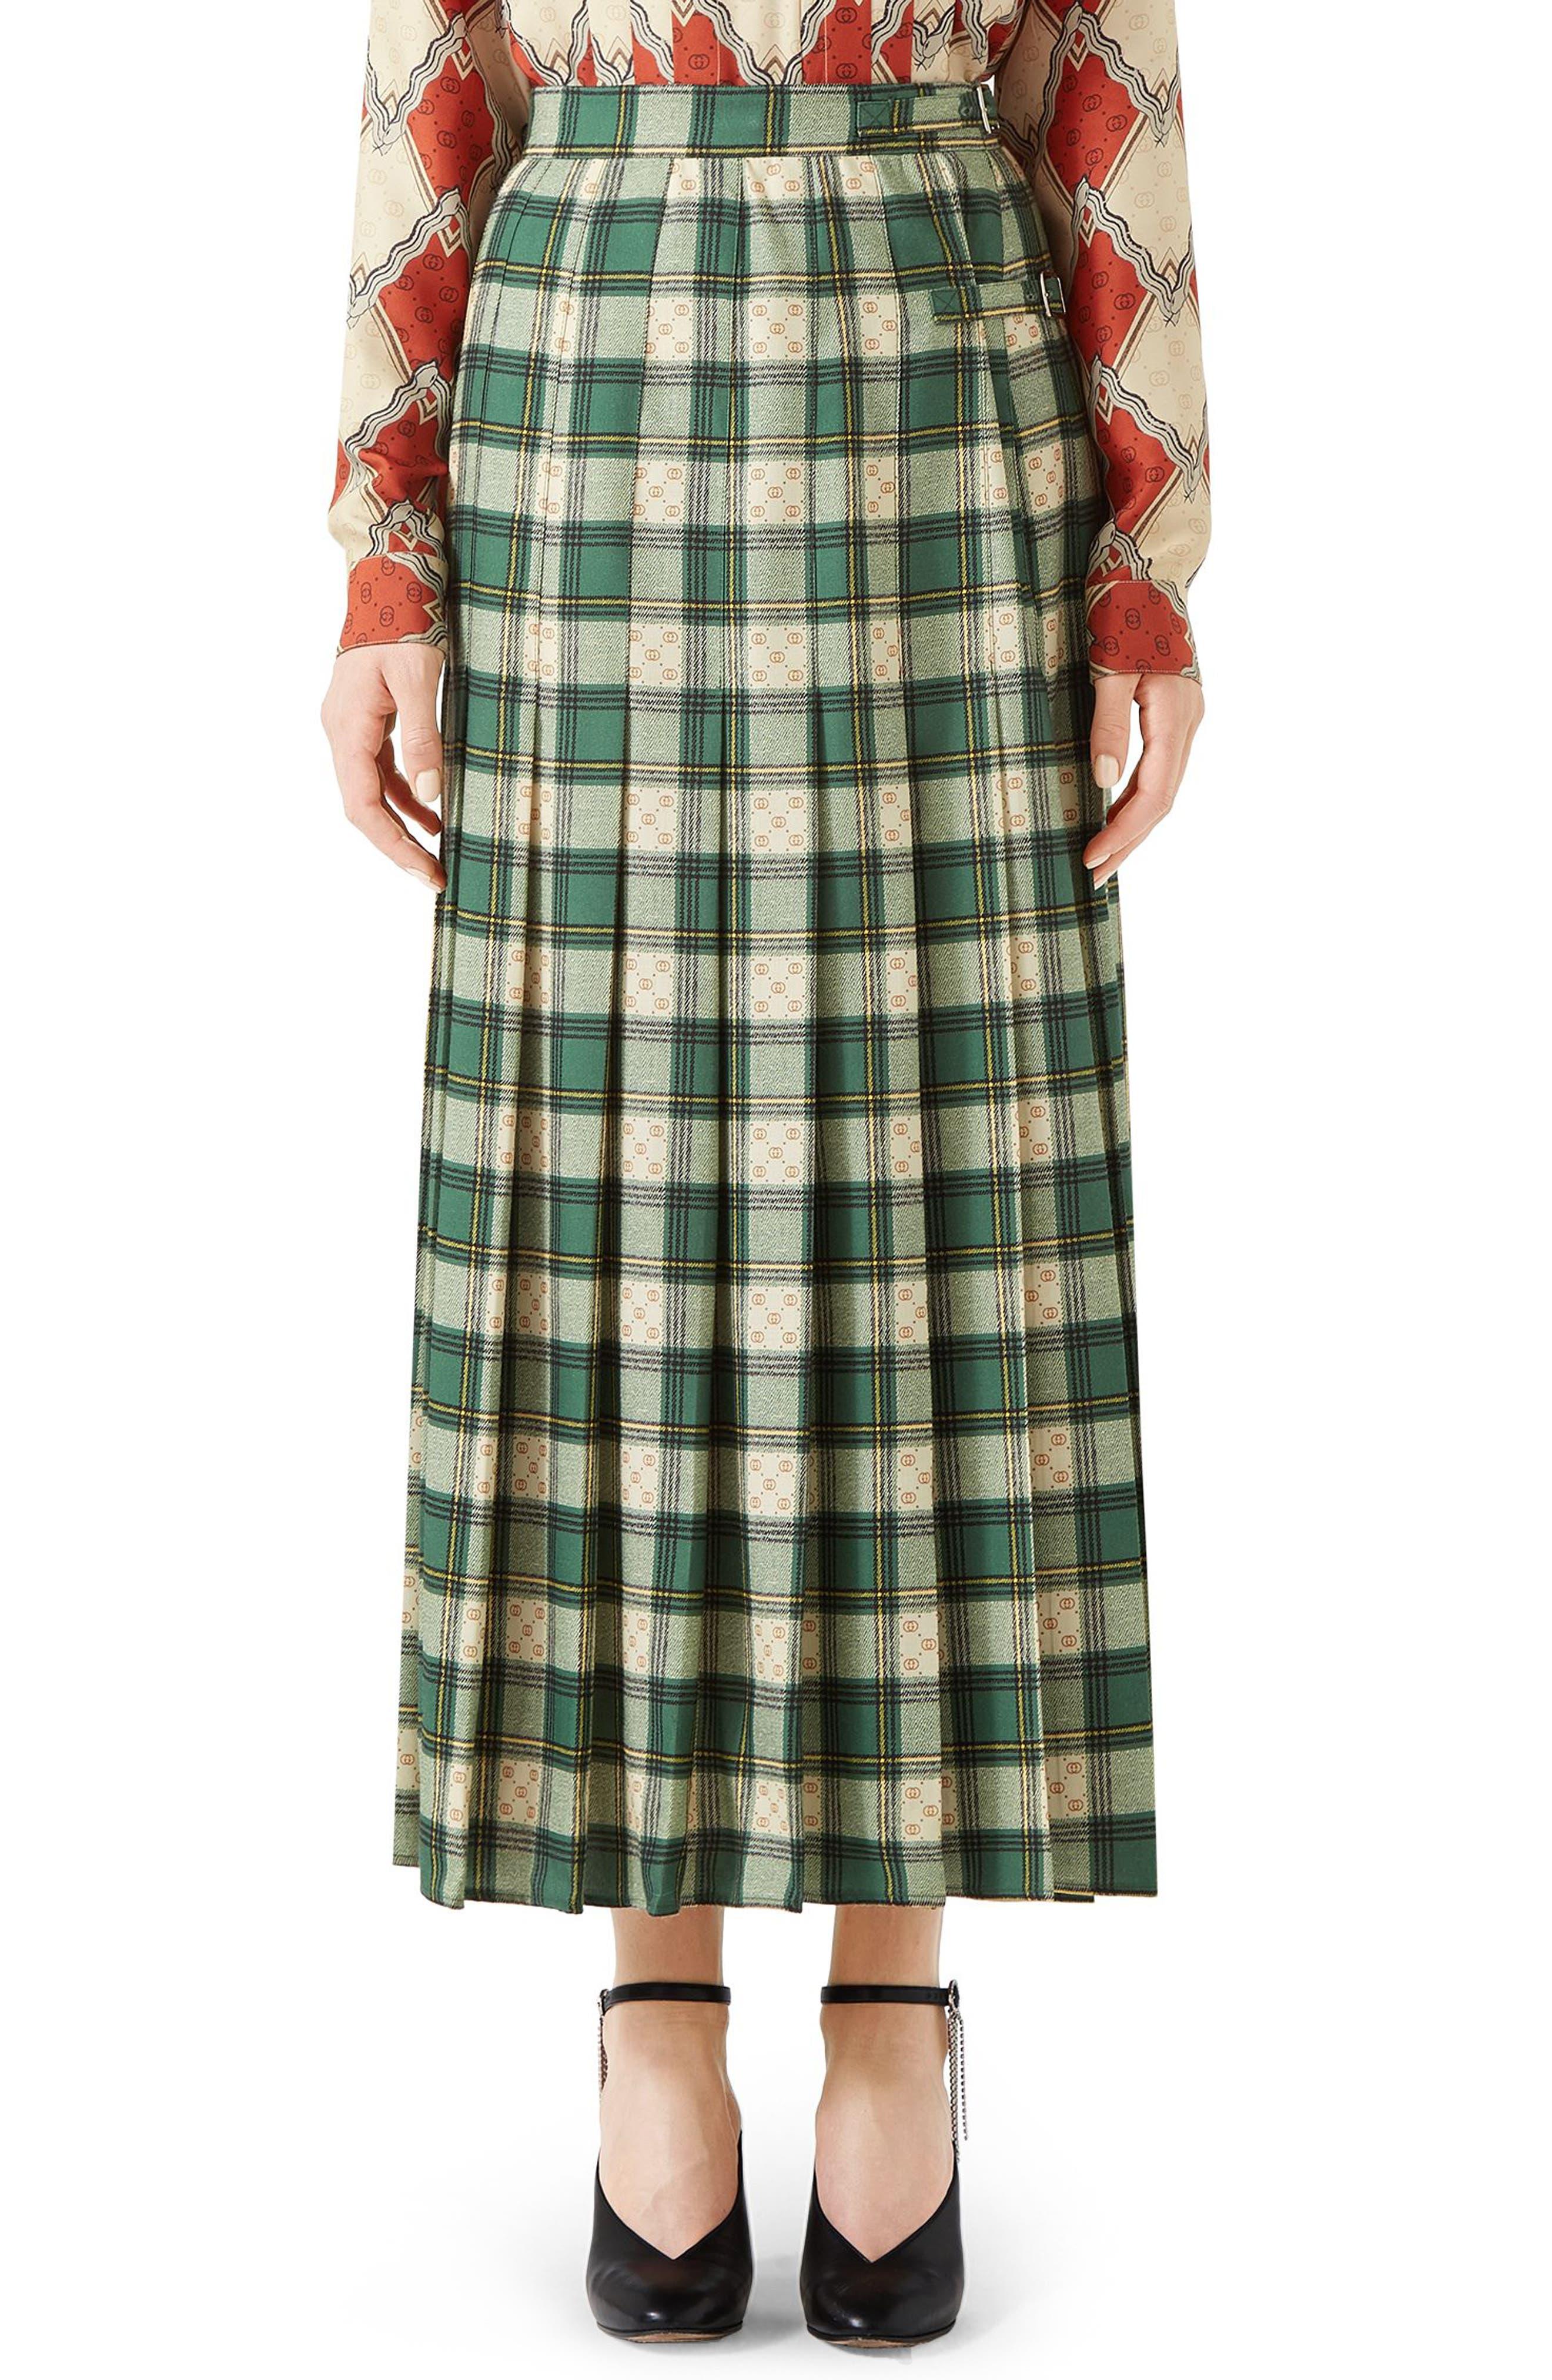 Tartan Check Wool Twill Maxi Skirt,                             Main thumbnail 1, color,                             3741 GREEN/ ROSE BEIGE PRI